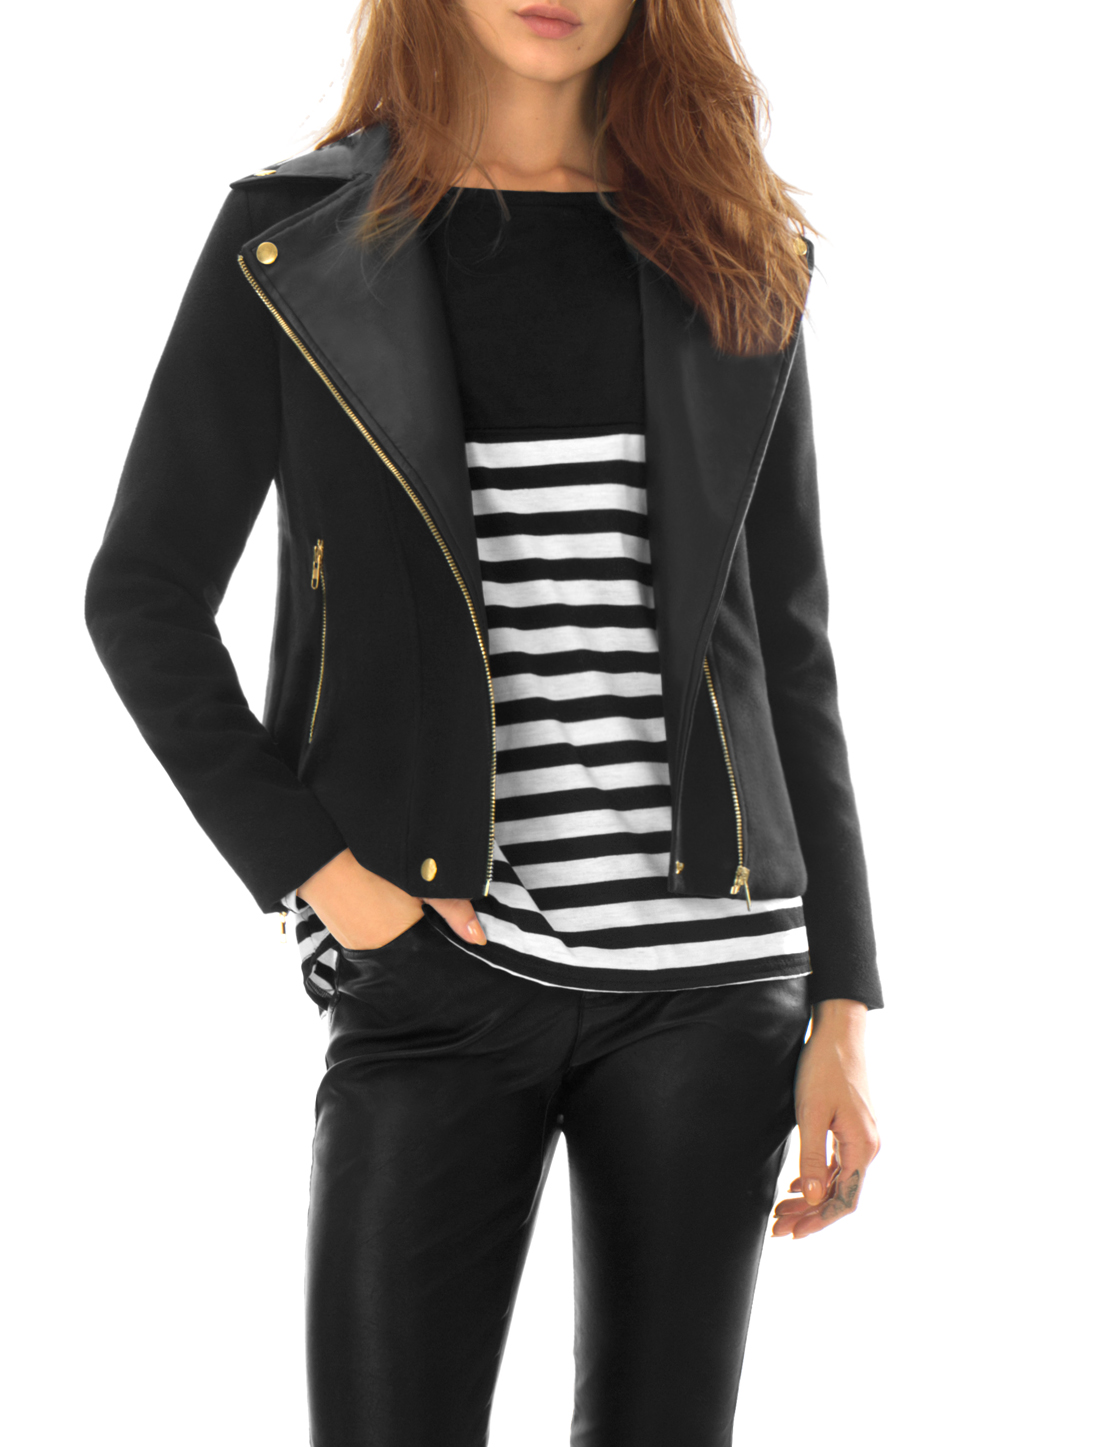 Women Asymmetrical Zipper Front PU Panel Worsted Jacket Black L